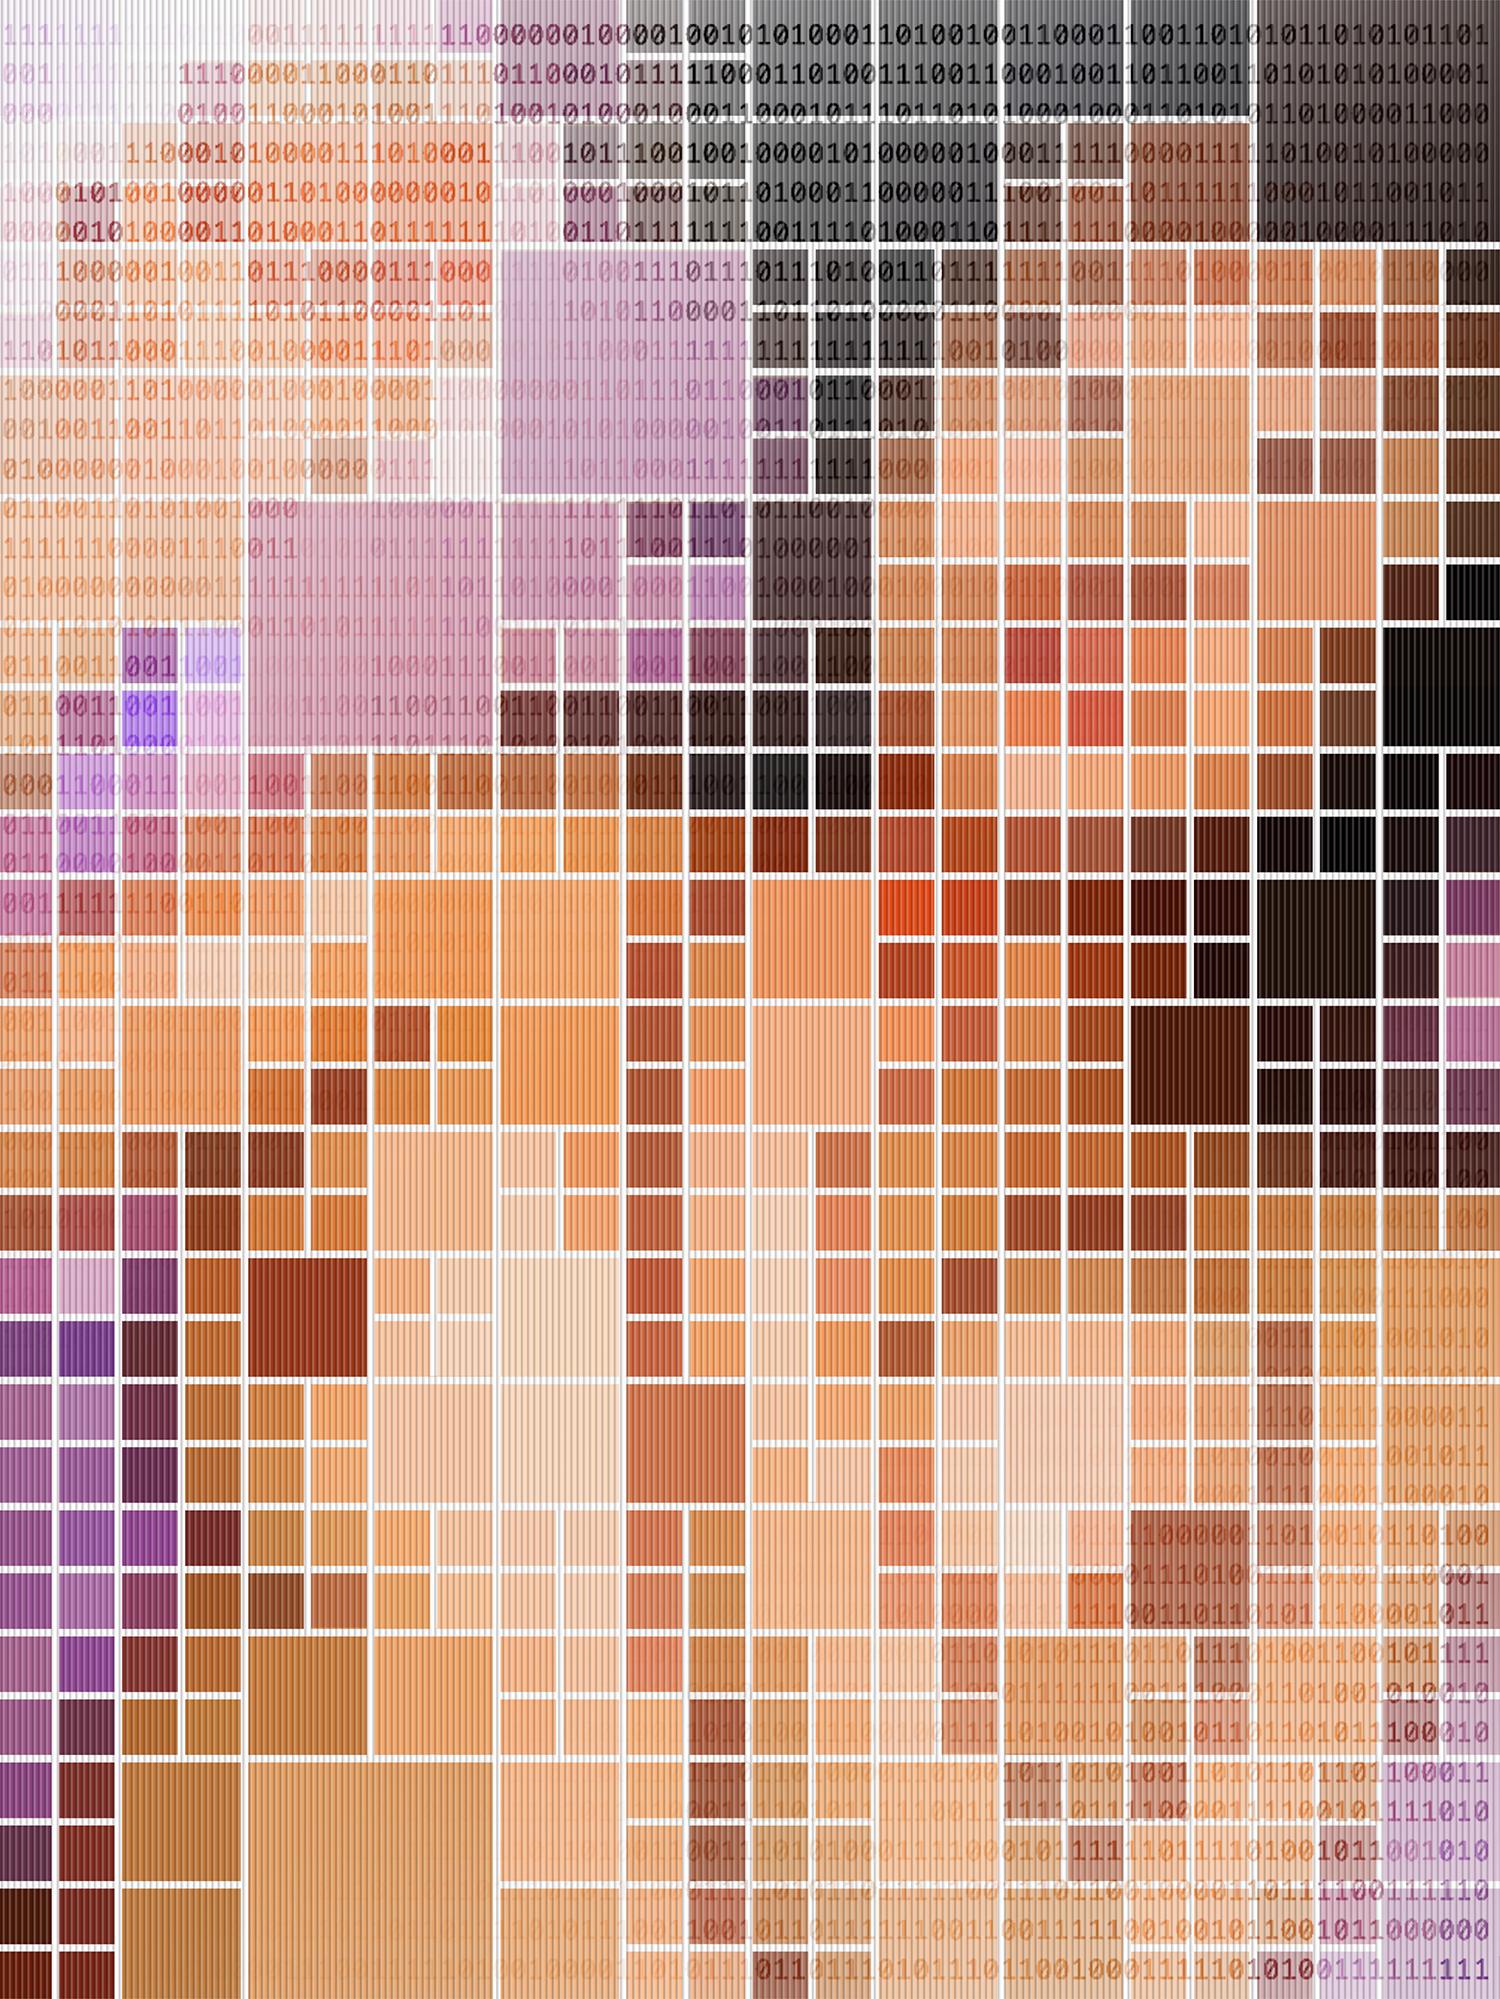 Binary Nude #3 •2005 •Photograph, lenticular print •23.6 x 17.8 in